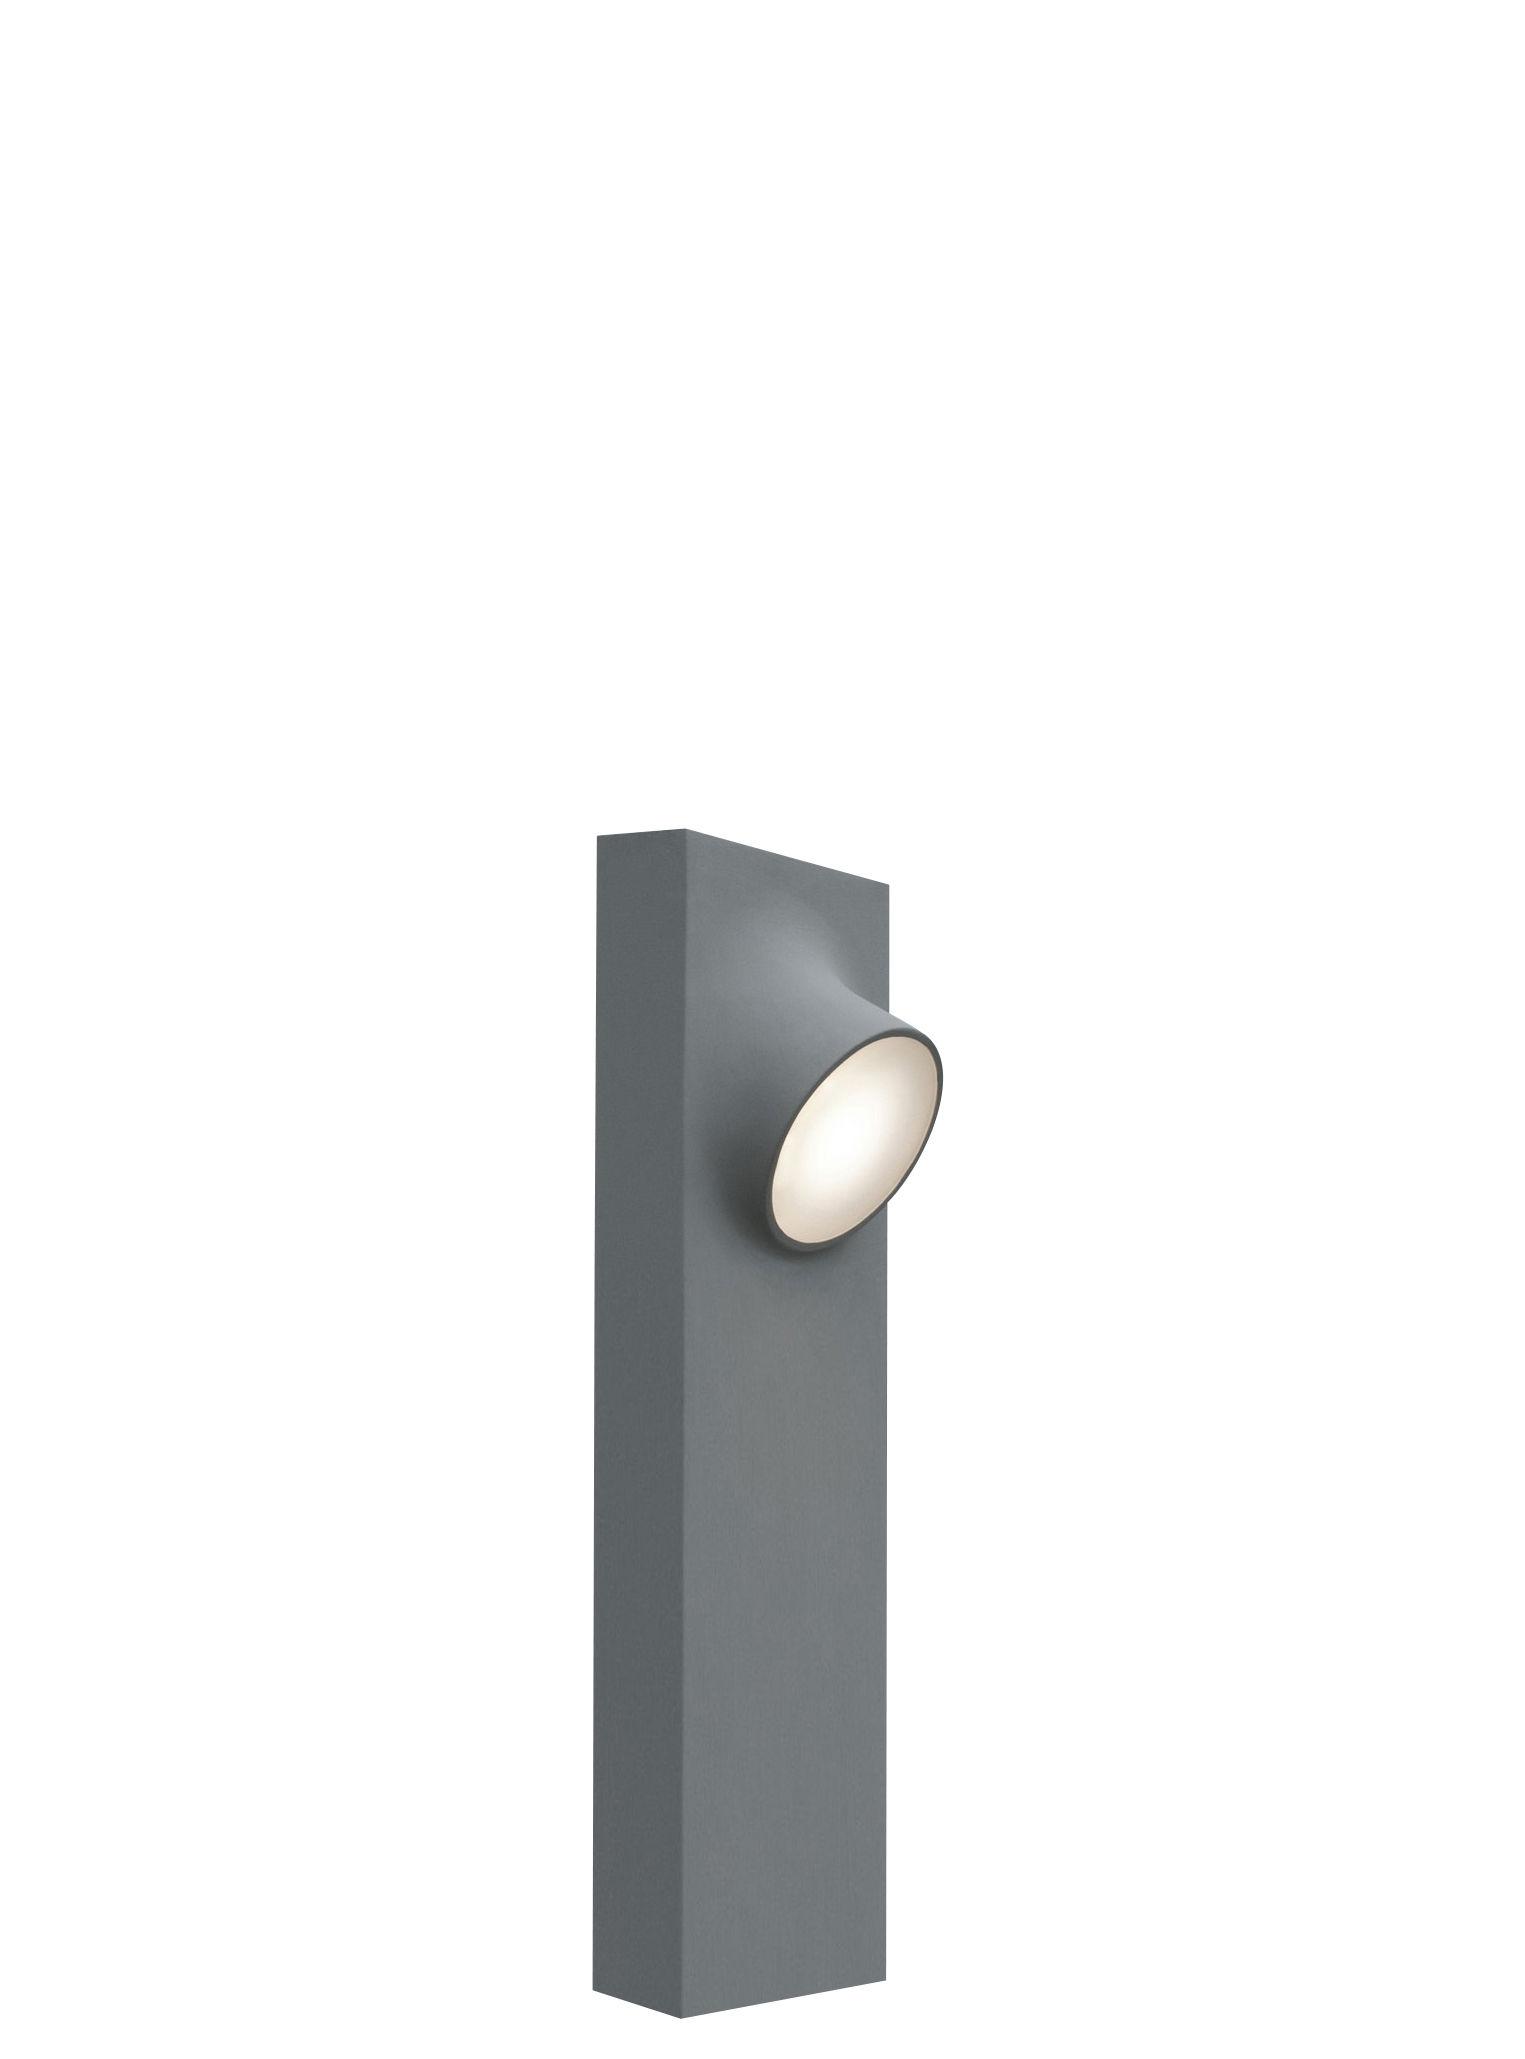 Lighting - Outdoor Lighting - Ciclope Double LED Floor lamp - / outdoor - H 50 cm by Artemide - Grey - H 50 cm - Galvanized aluminium